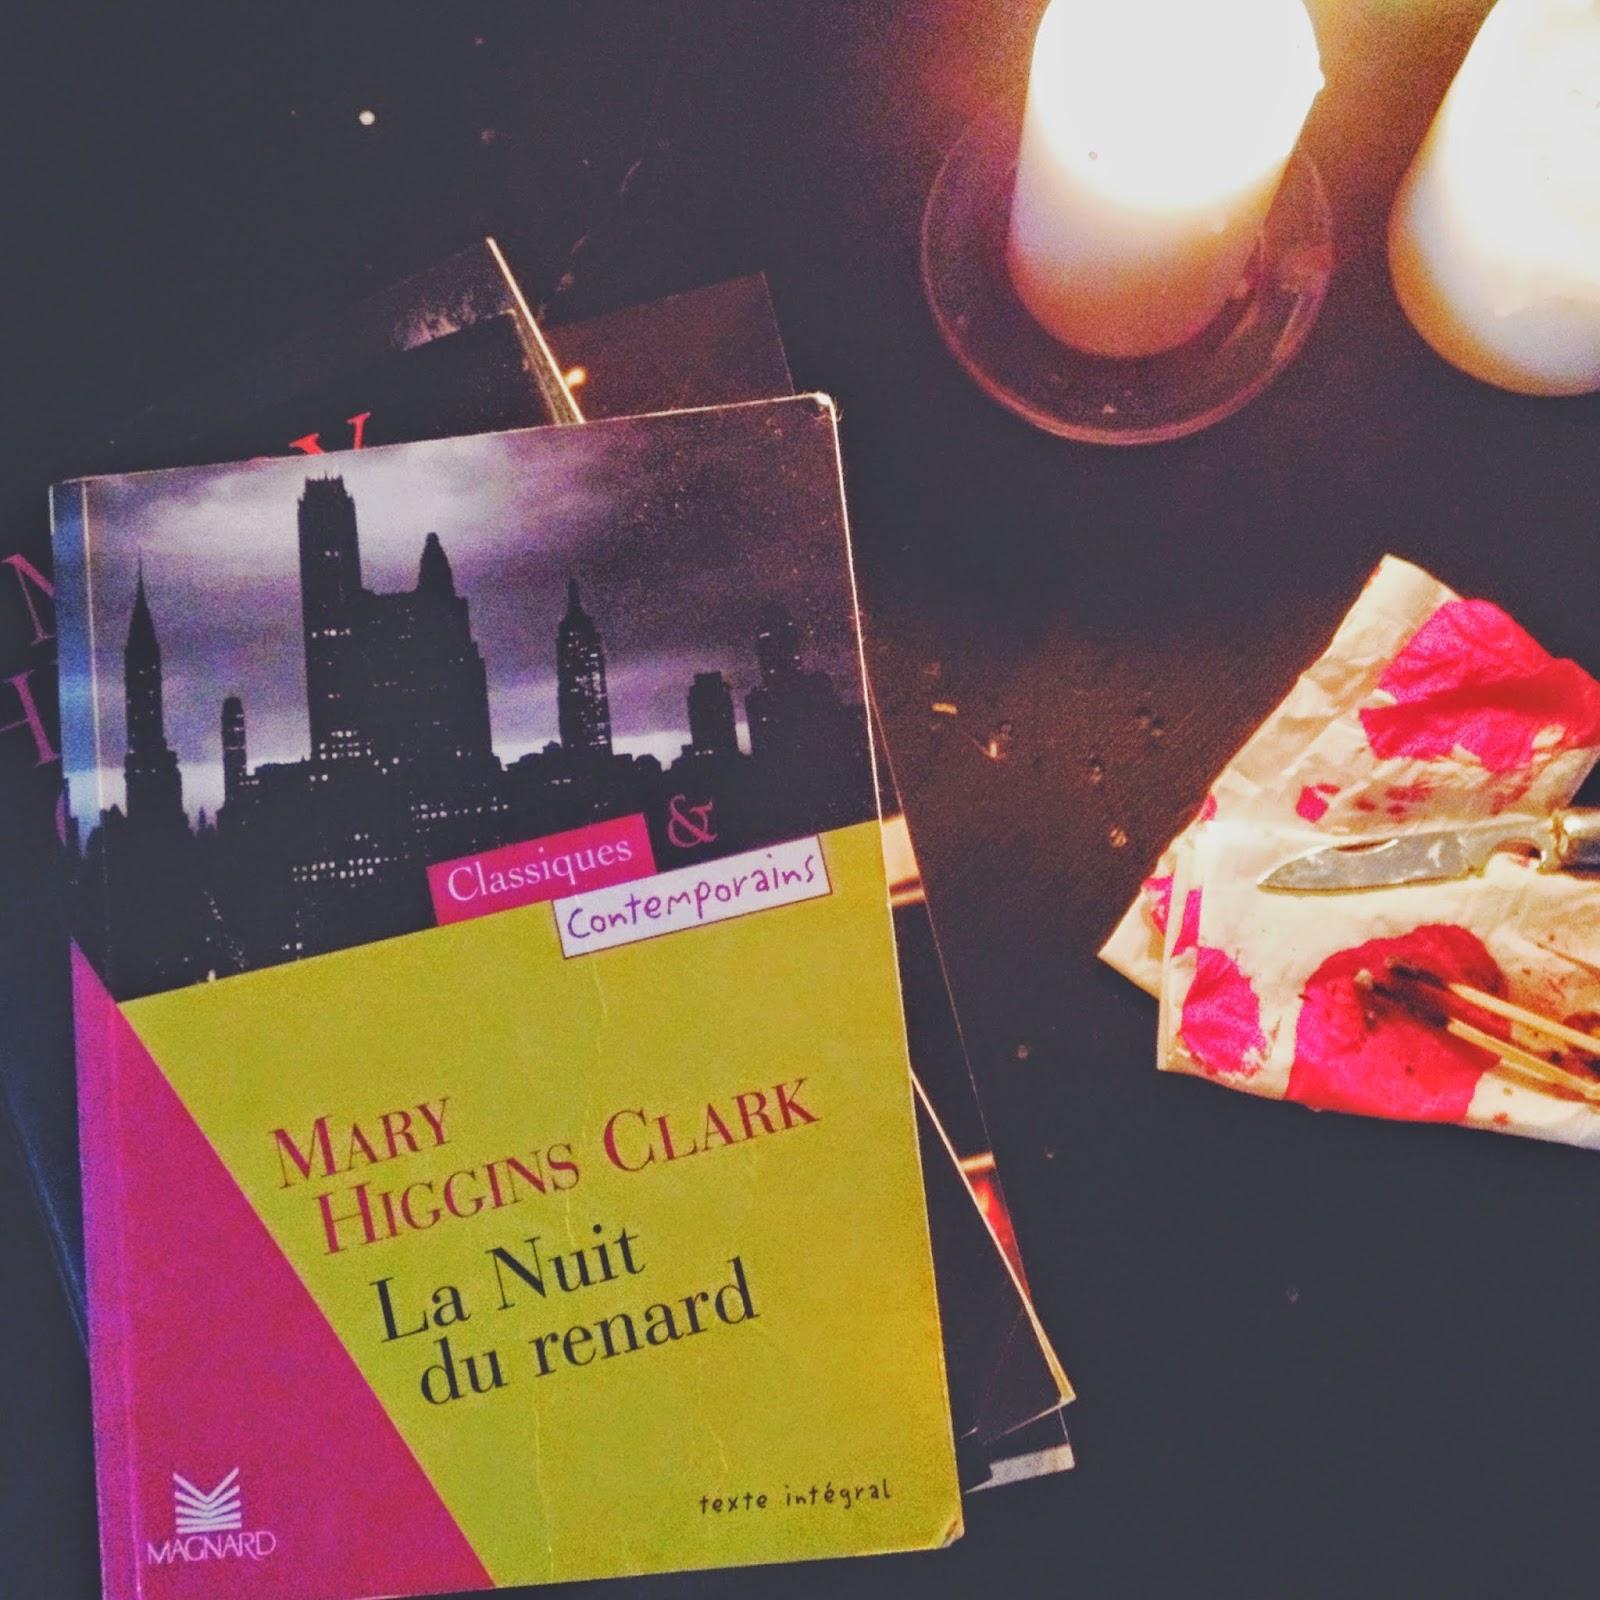 La nuit du Renard Mary Higgins Clark